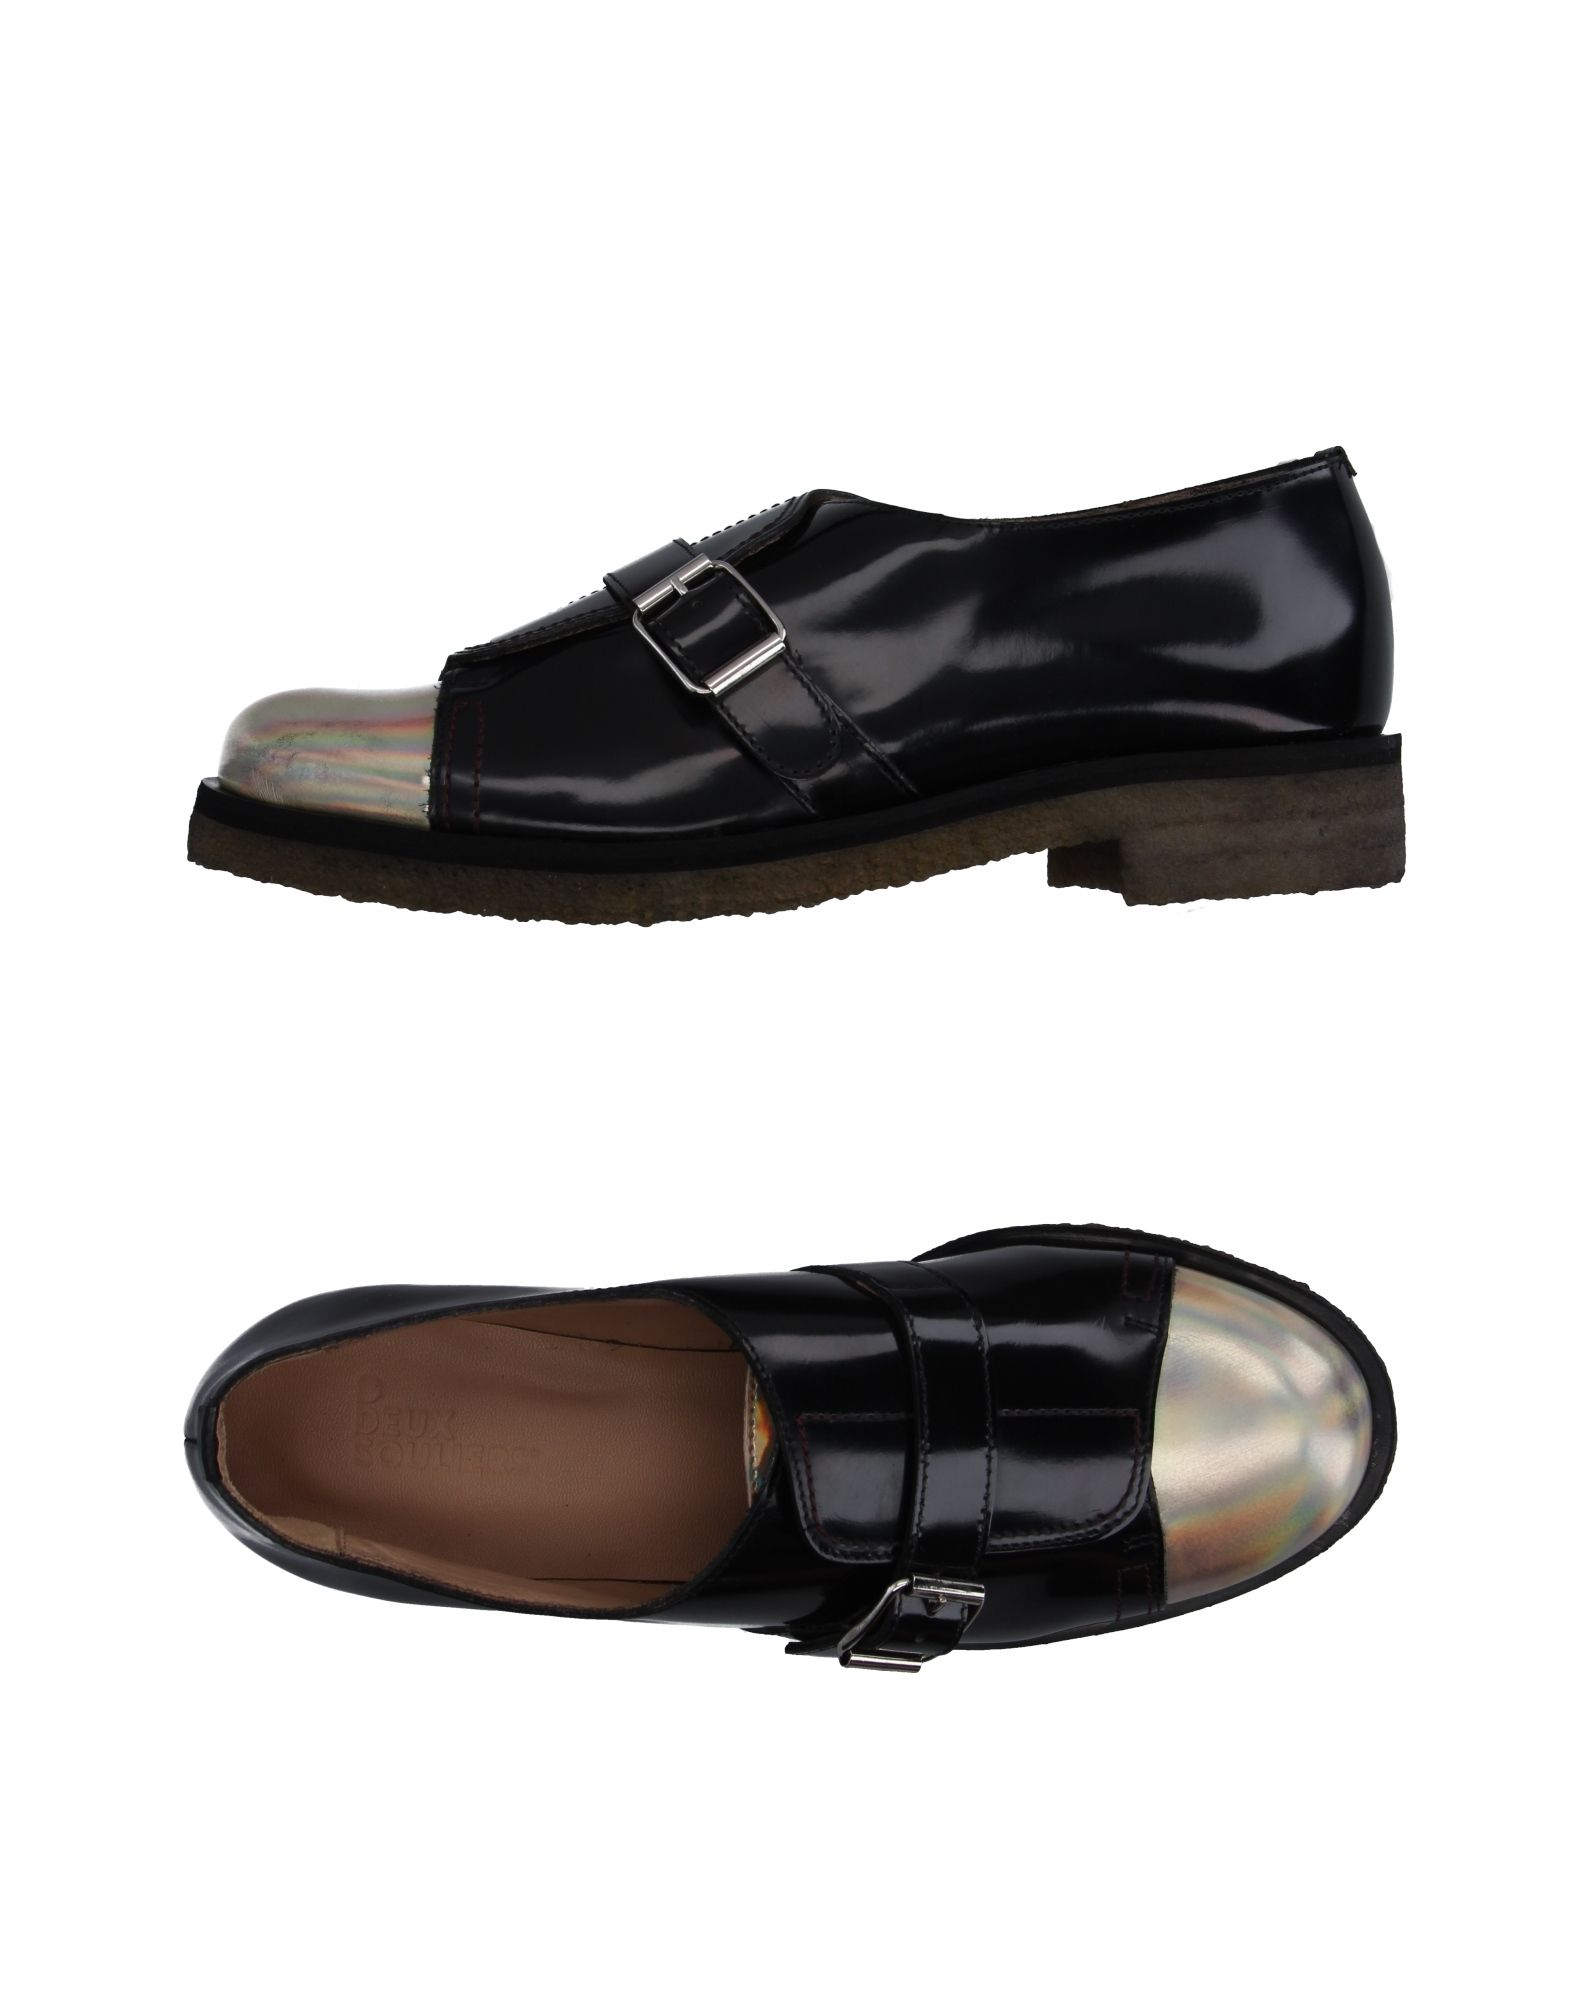 Deux Souliers Mokassins Damen 11187444RV Gute Qualität beliebte Schuhe